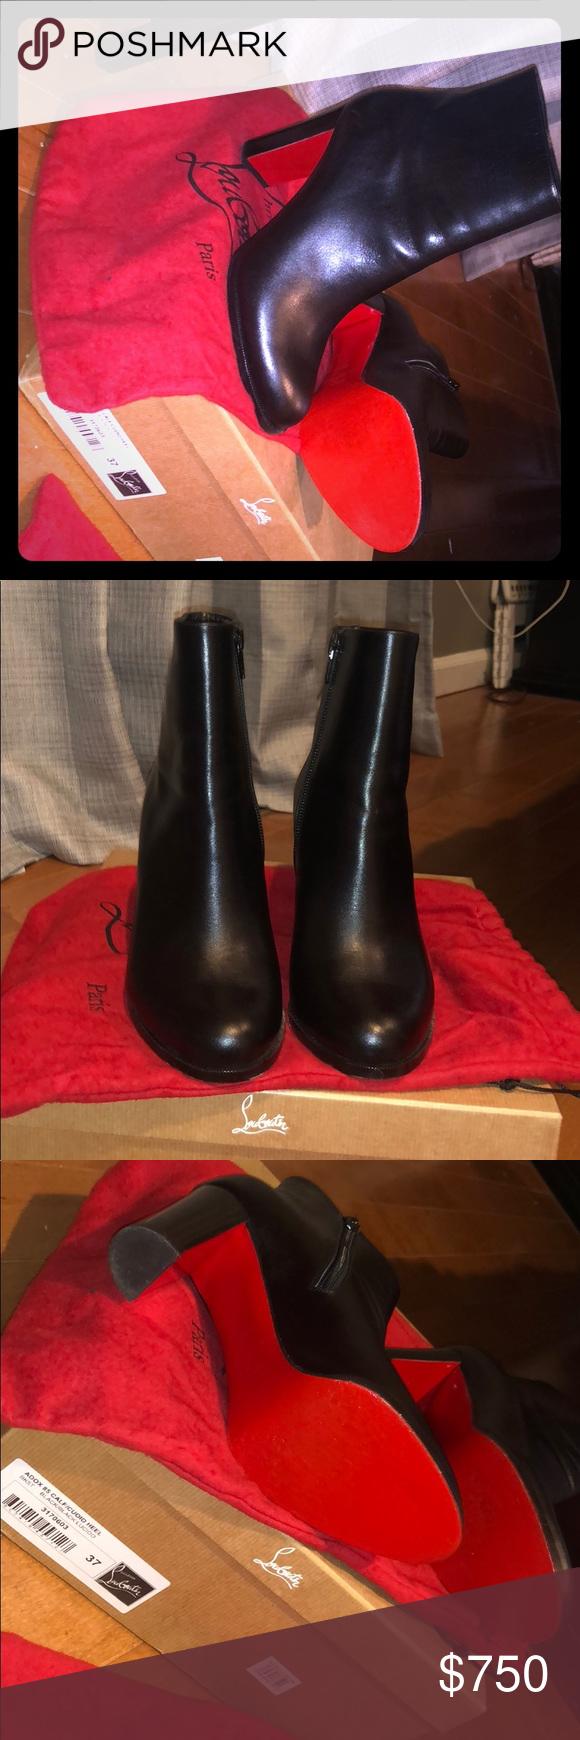 buy online 7331e cbdf3 Christian Louboutin ADOX 85 CALF/CUOIO HEEL Only worn twice ...